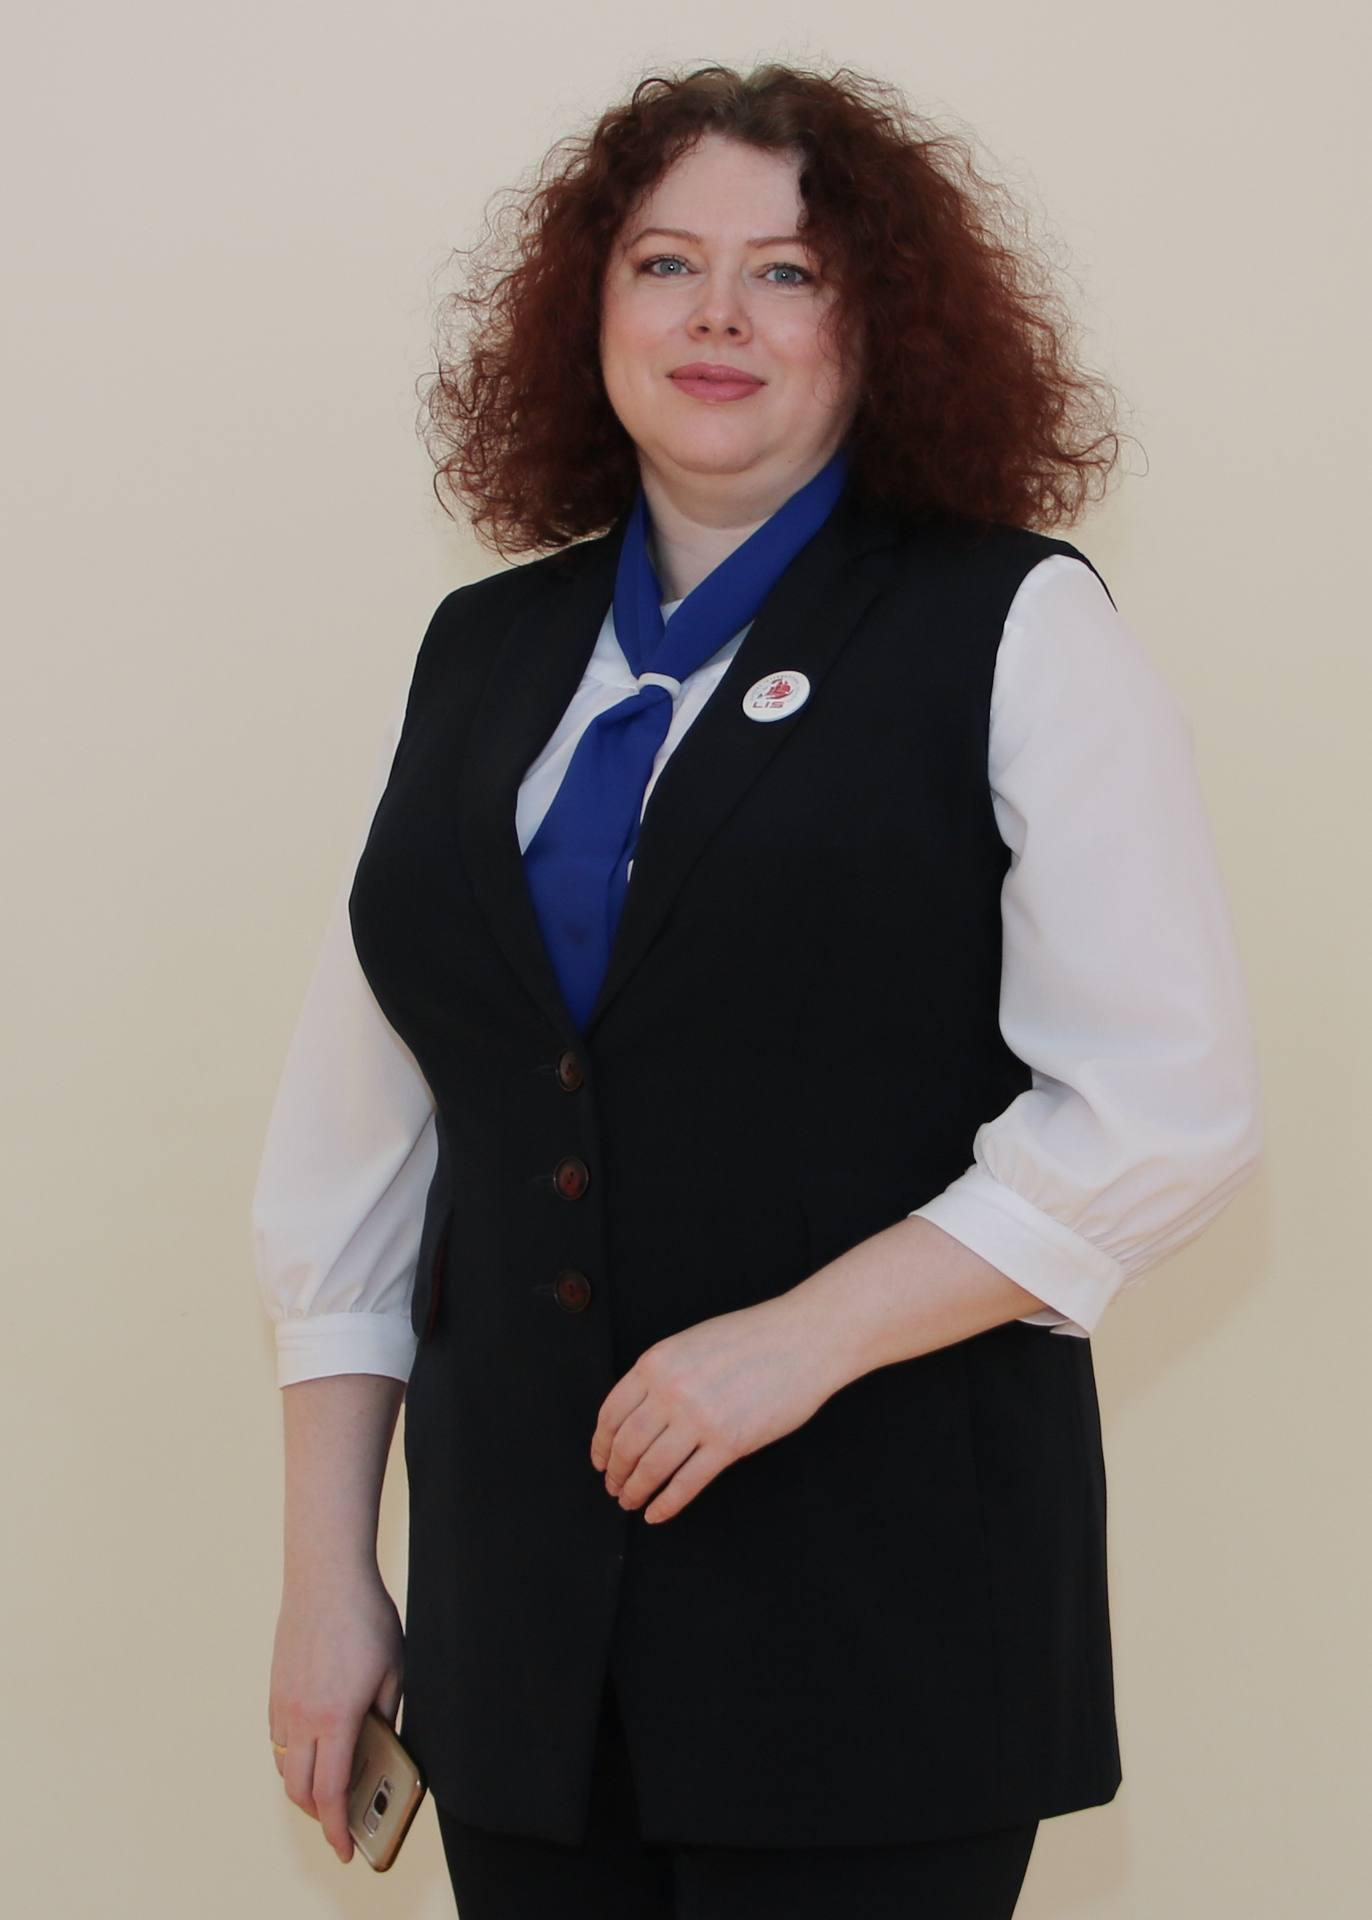 Кирш Екатерина Юрьевна